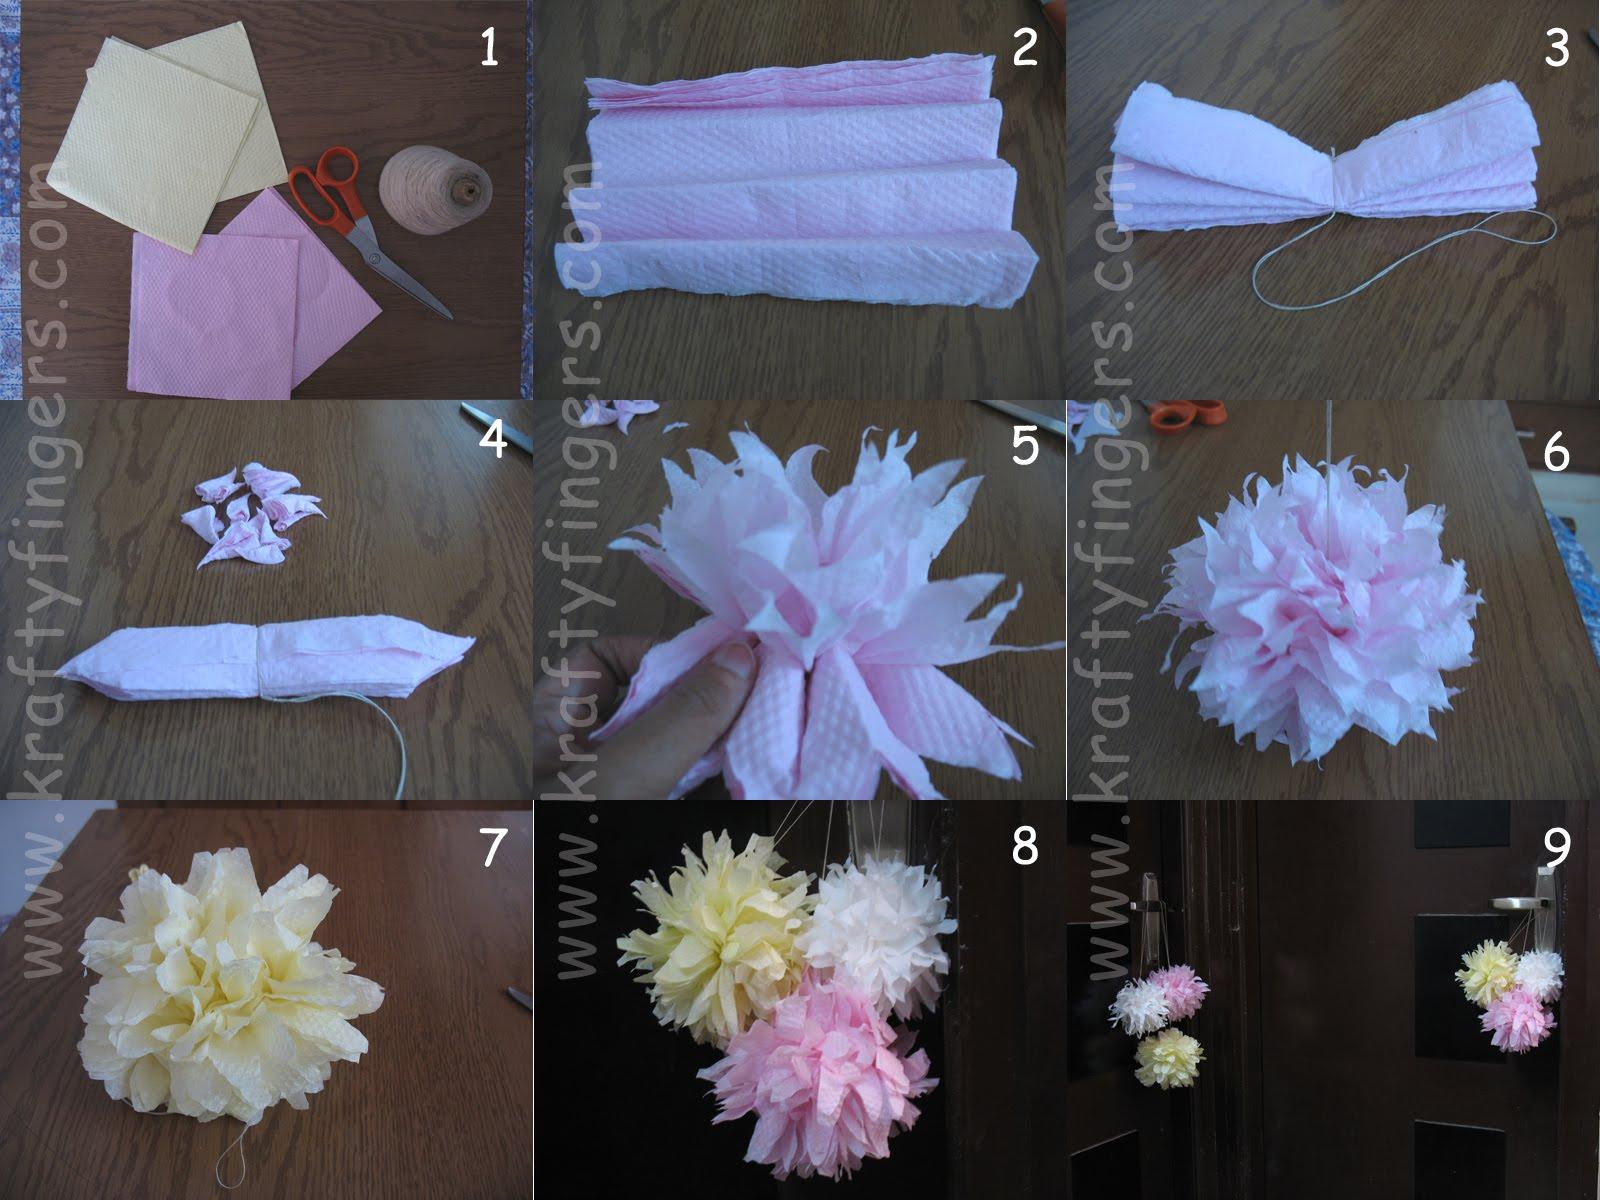 Fall flowers paper napkins gardening flower and vegetables paper napkin dahlias flower making kraftyfingers mightylinksfo